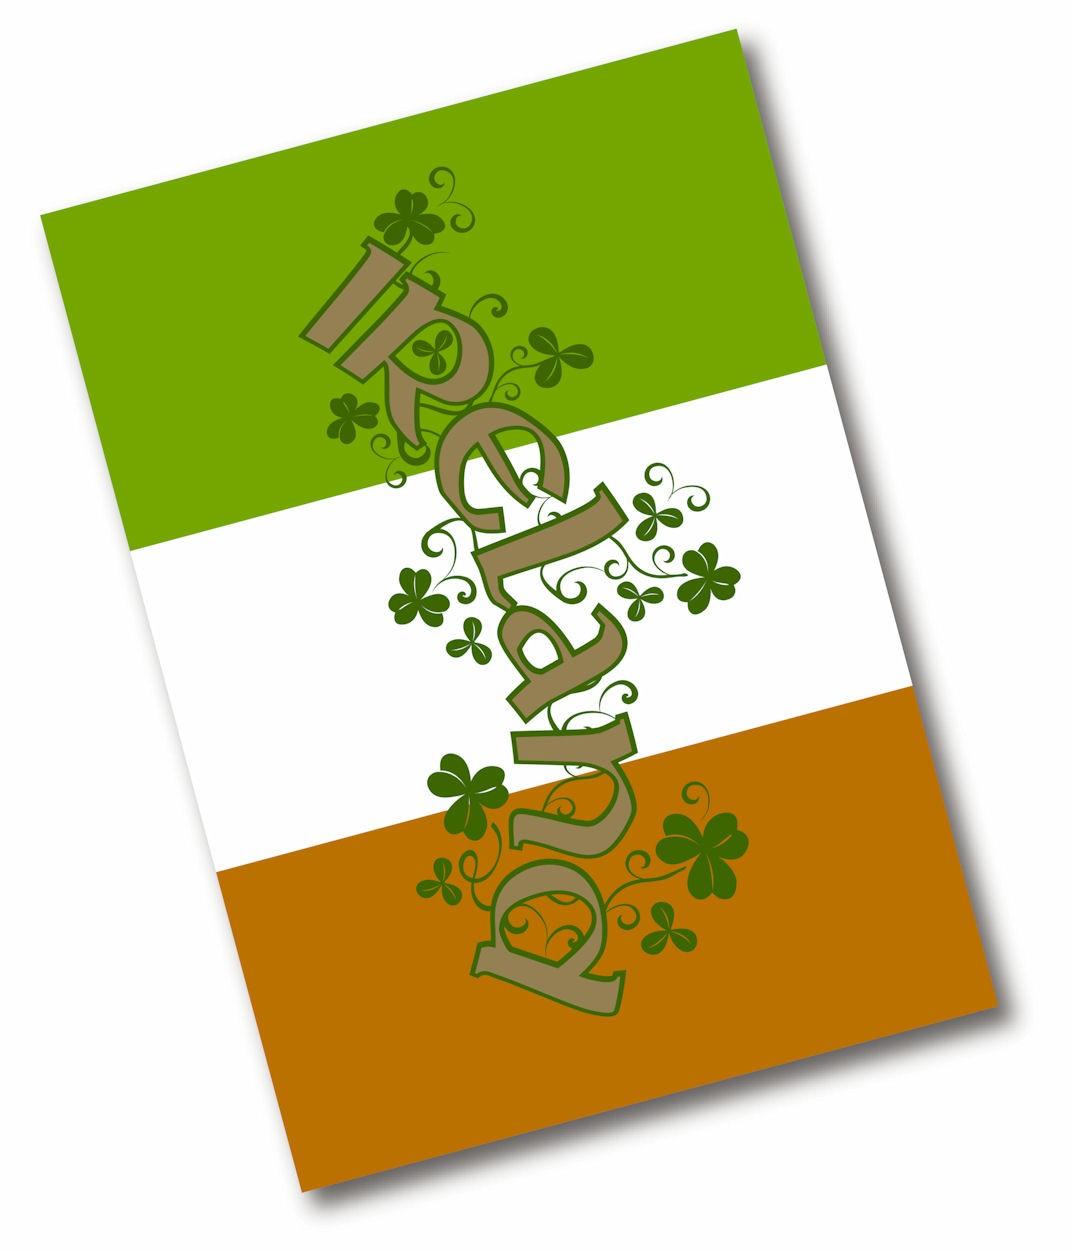 geschirrtuch ireland flag irish. Black Bedroom Furniture Sets. Home Design Ideas